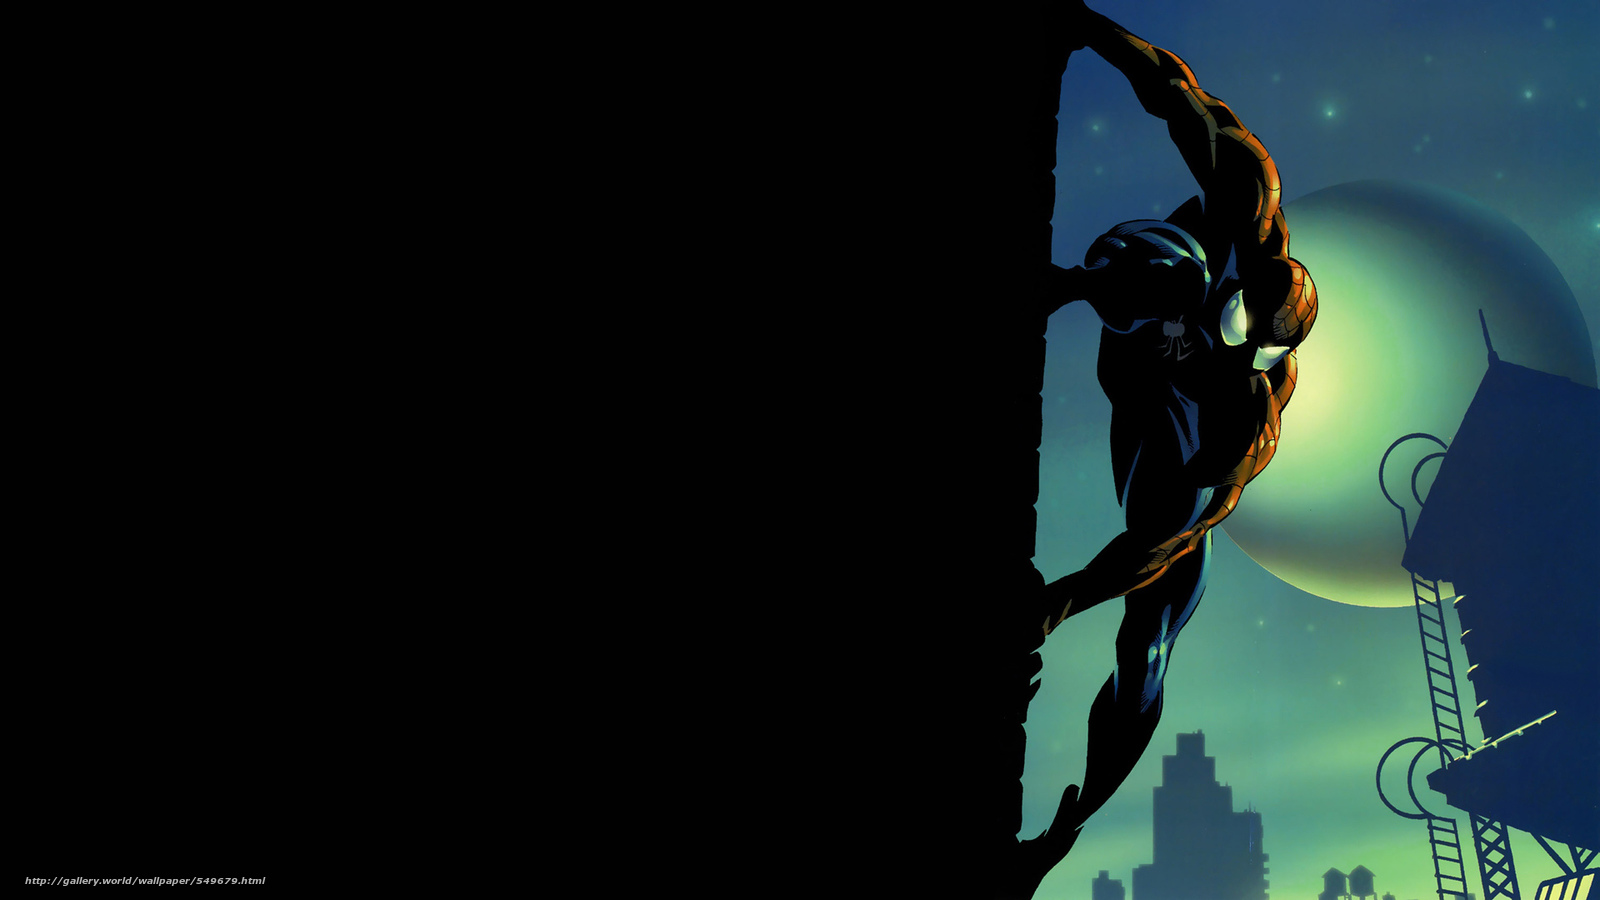 Download wallpaper Spider-Man,  comic strip,  cartoon,  art free desktop wallpaper in the resolution 1920x1080 — picture №549679